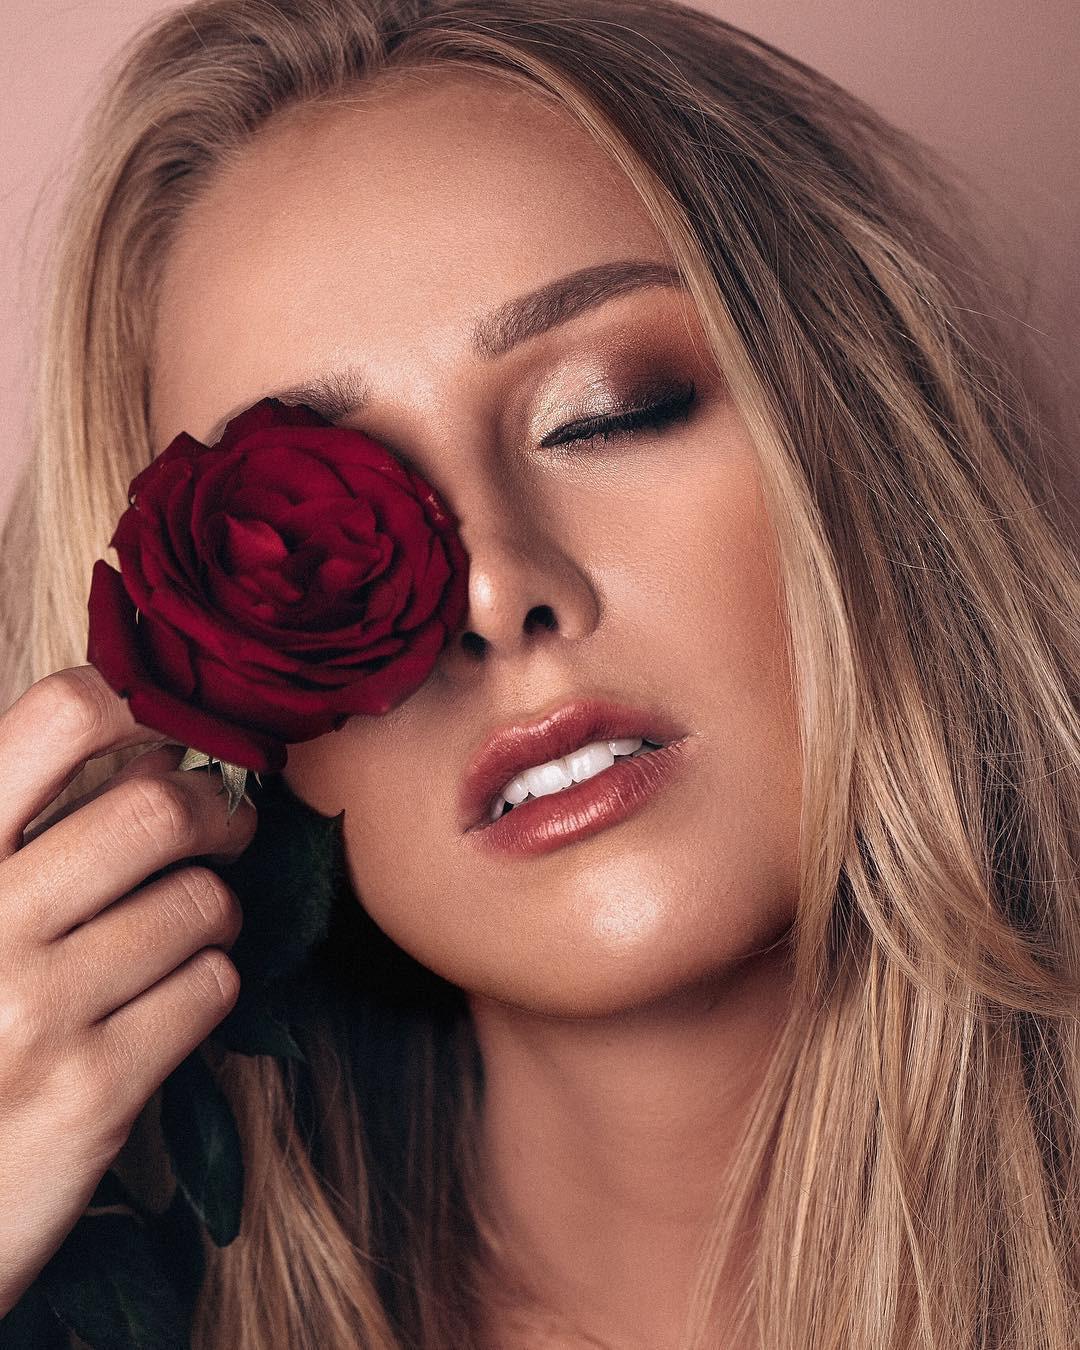 elizama aguilar, top 5 de miss brasil mundo 2019. - Página 4 Bd28mj10